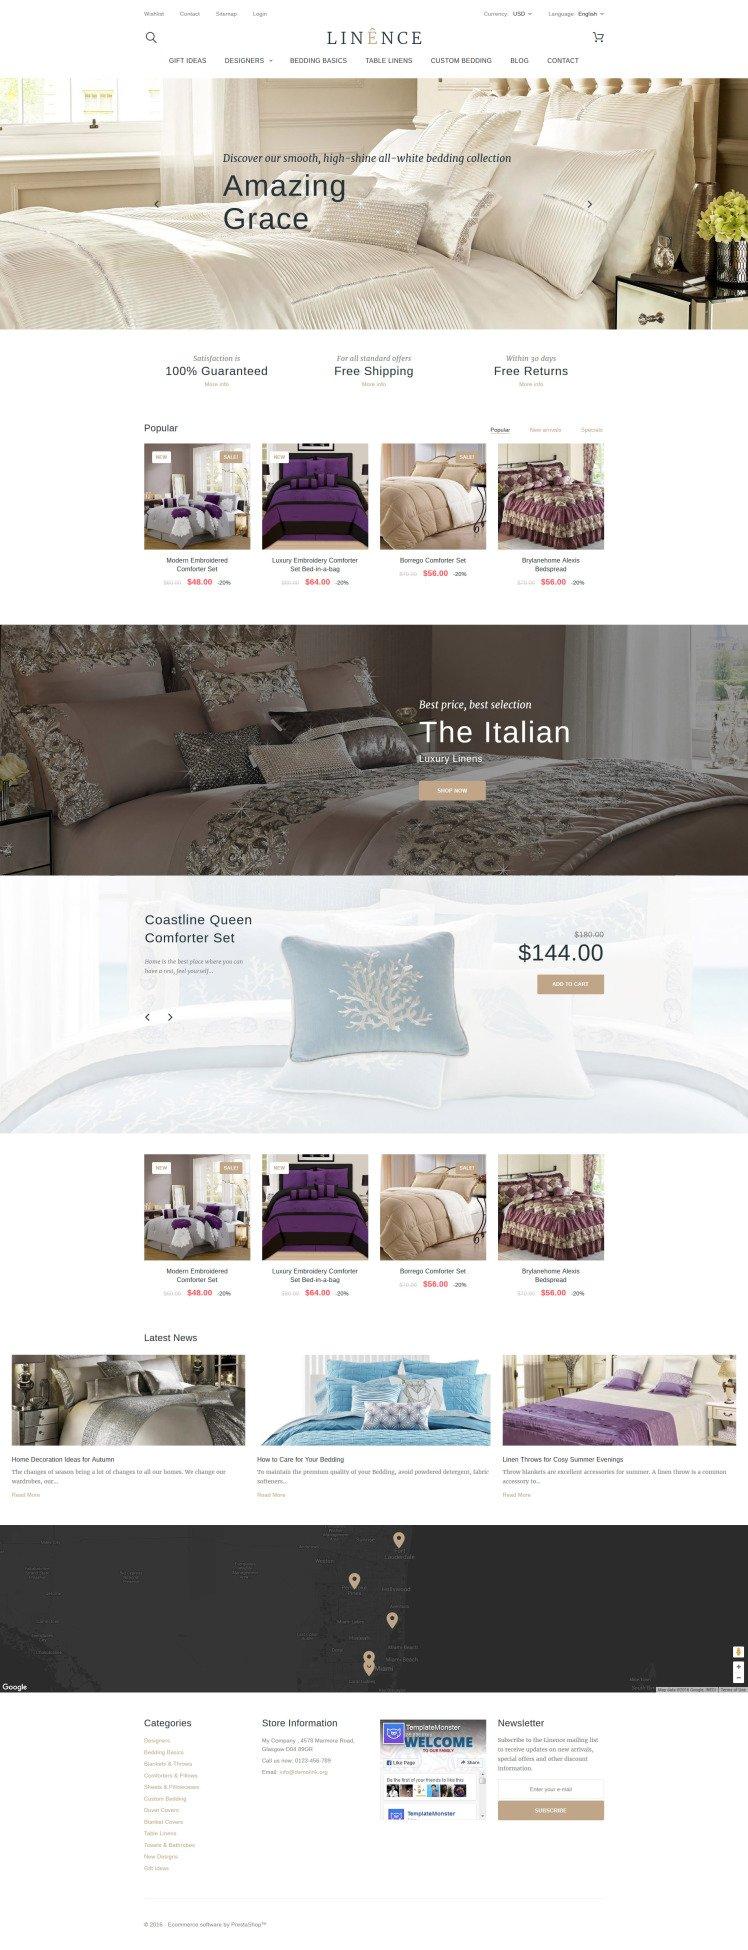 Linence Bed Linen PrestaShop Themes